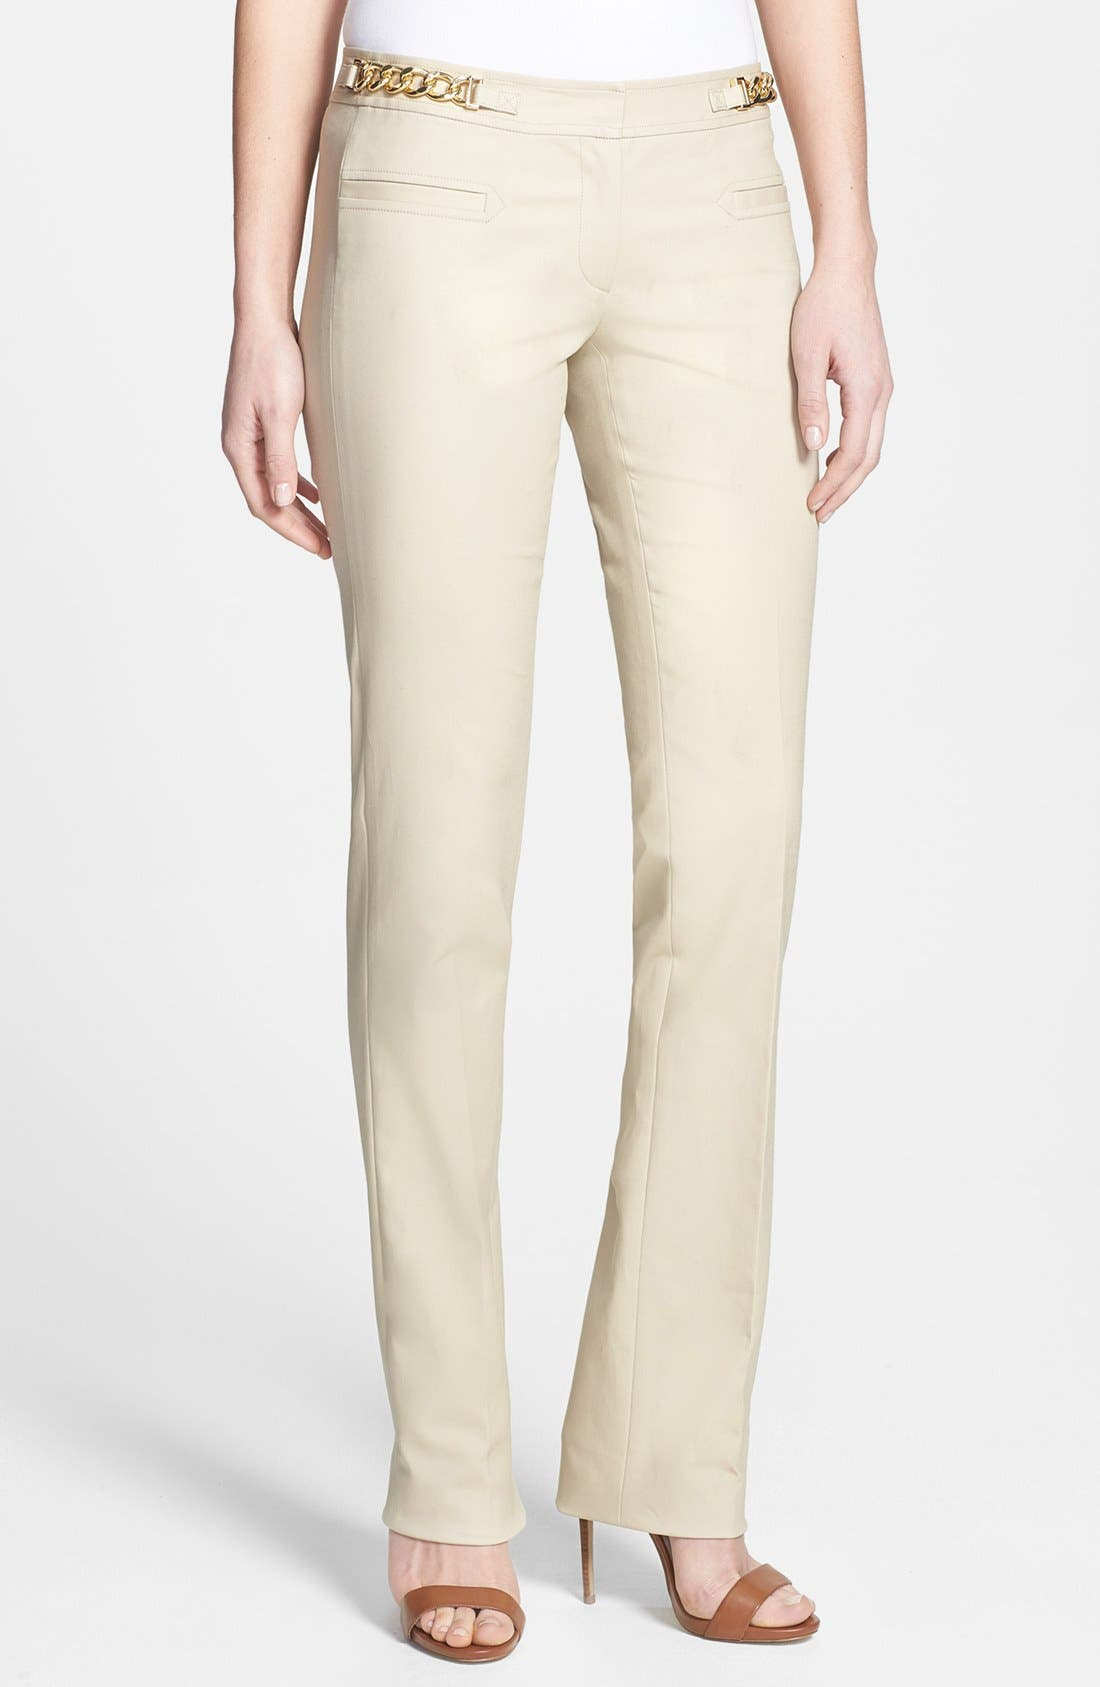 Alternate Image 1 Selected - MICHAEL Michael Kors 'Sexy' Hardware Detail Stretch Cotton Pants